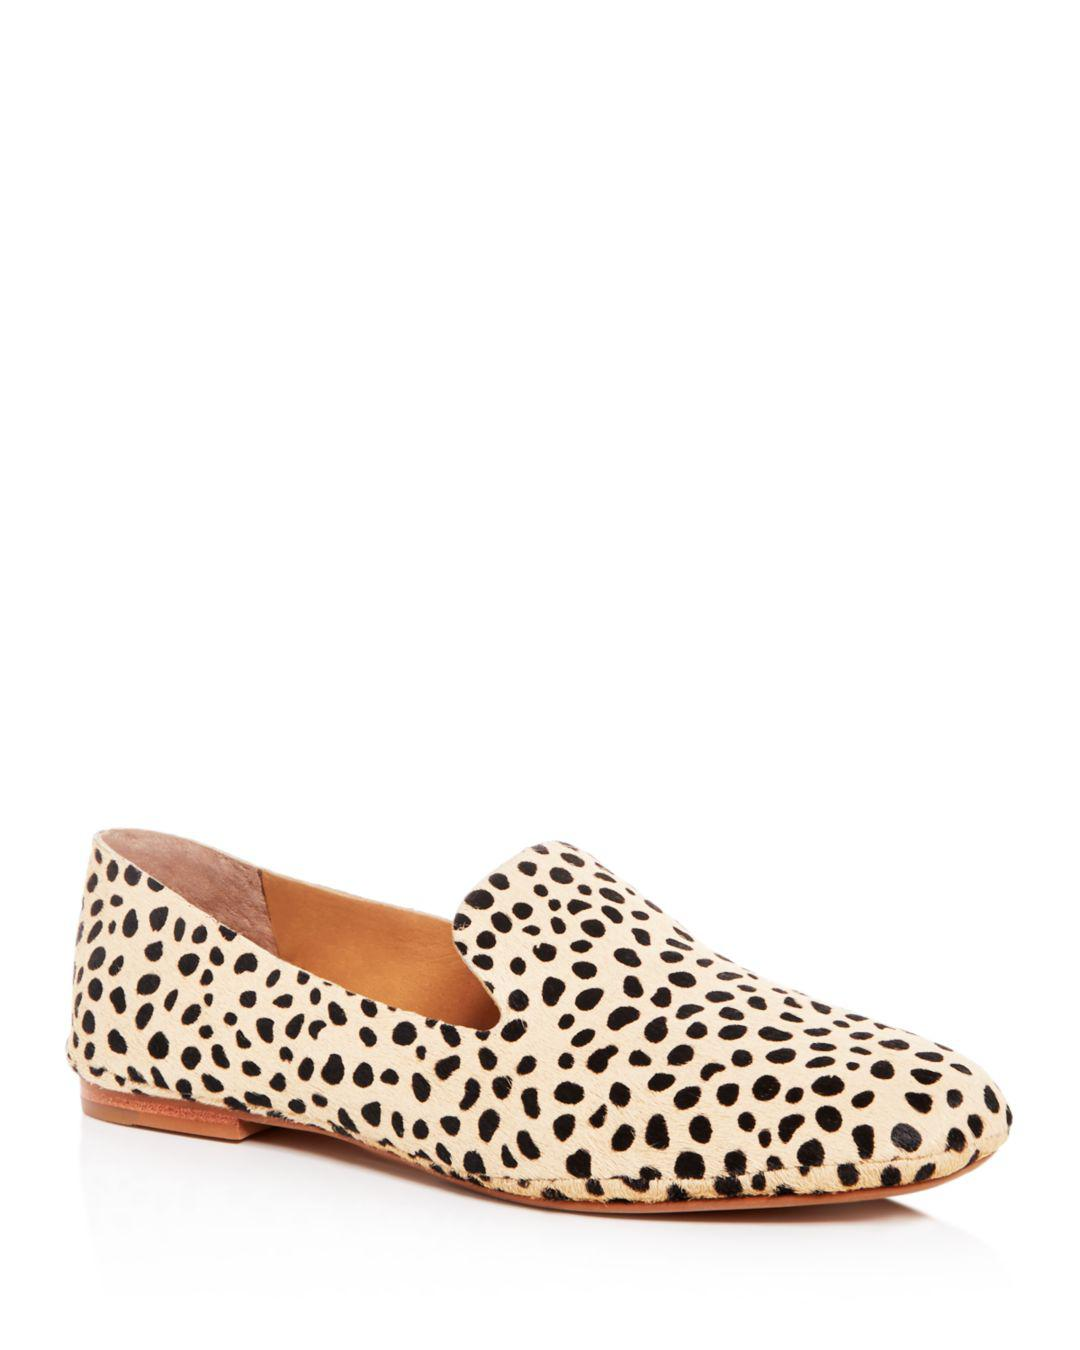 f196795d0d02 Lyst - Dolce Vita Women's Wynter Leopard Print Calf Hair Smoking ...